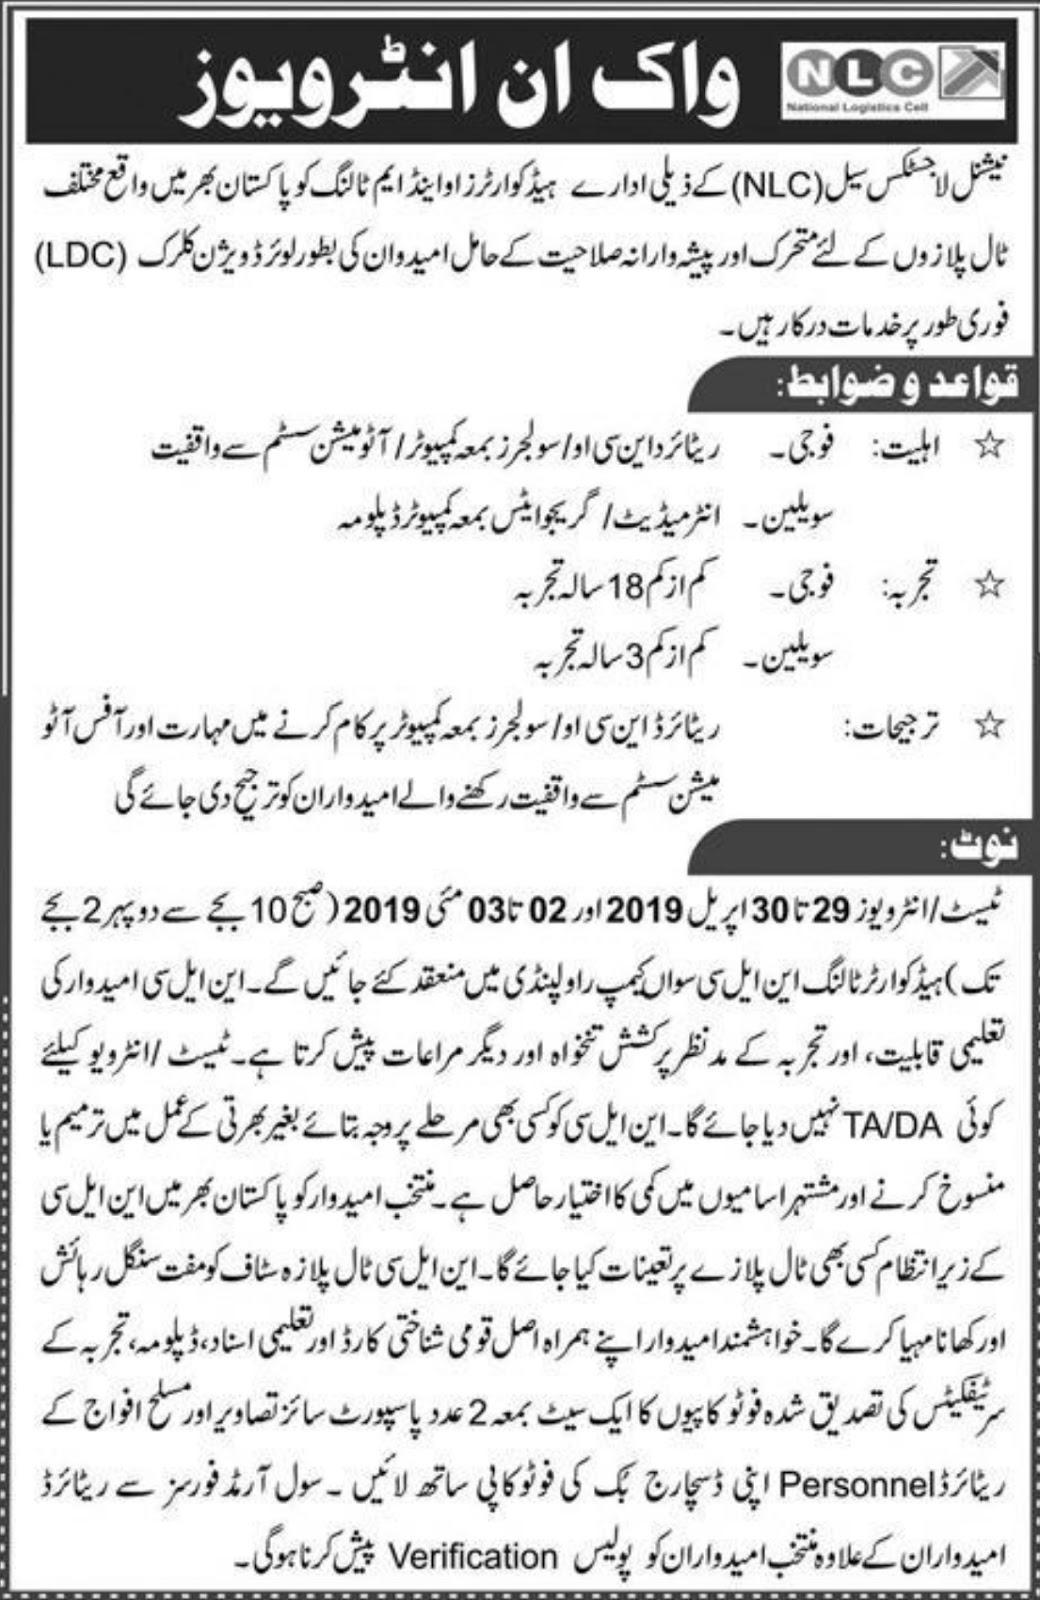 National Logistics Cell NLC Jobs 2019 www.nlc.com.pk